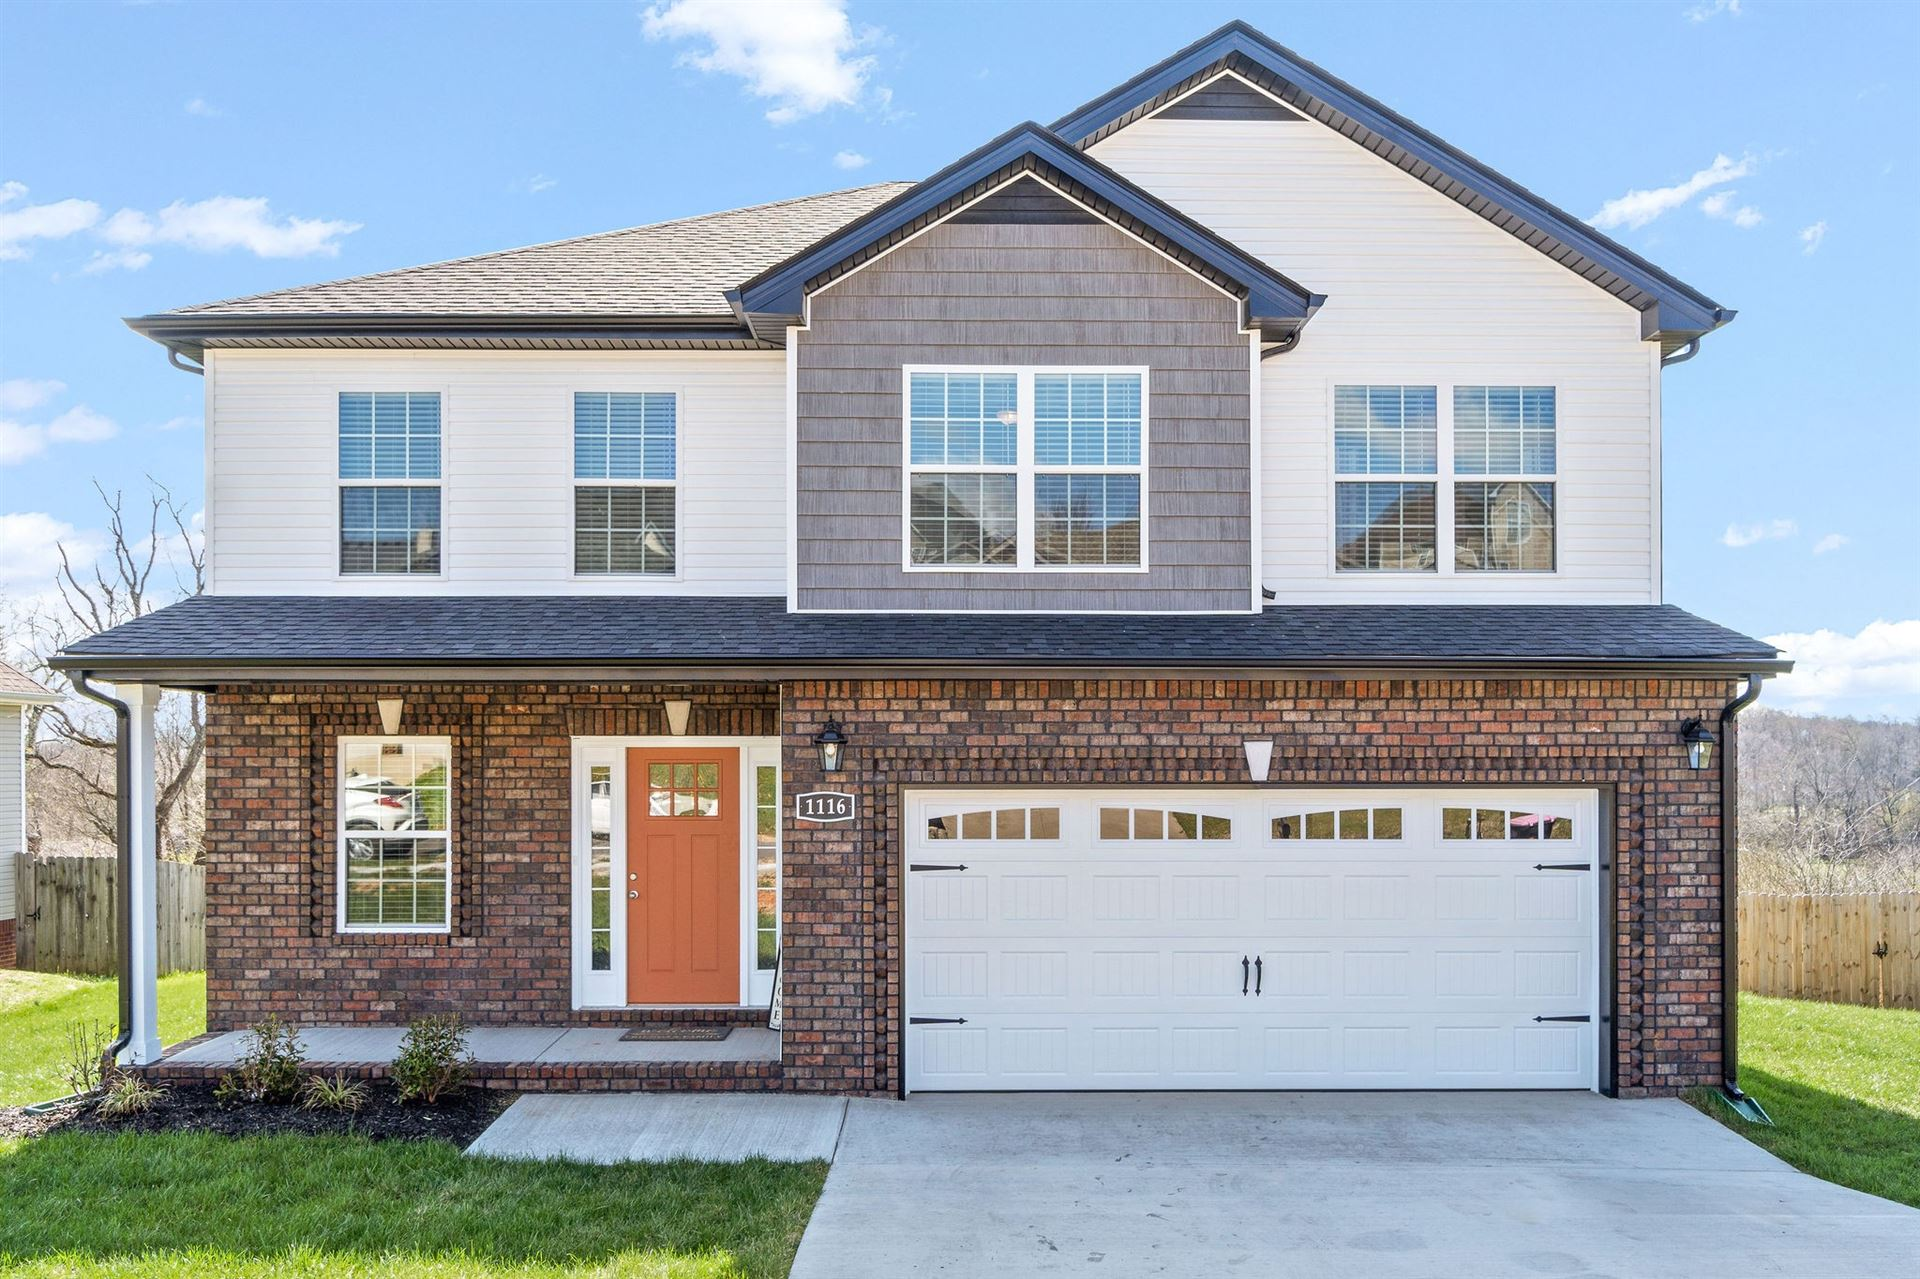 1116 Stillwood Dr, Clarksville, TN 37042 - MLS#: 2243787